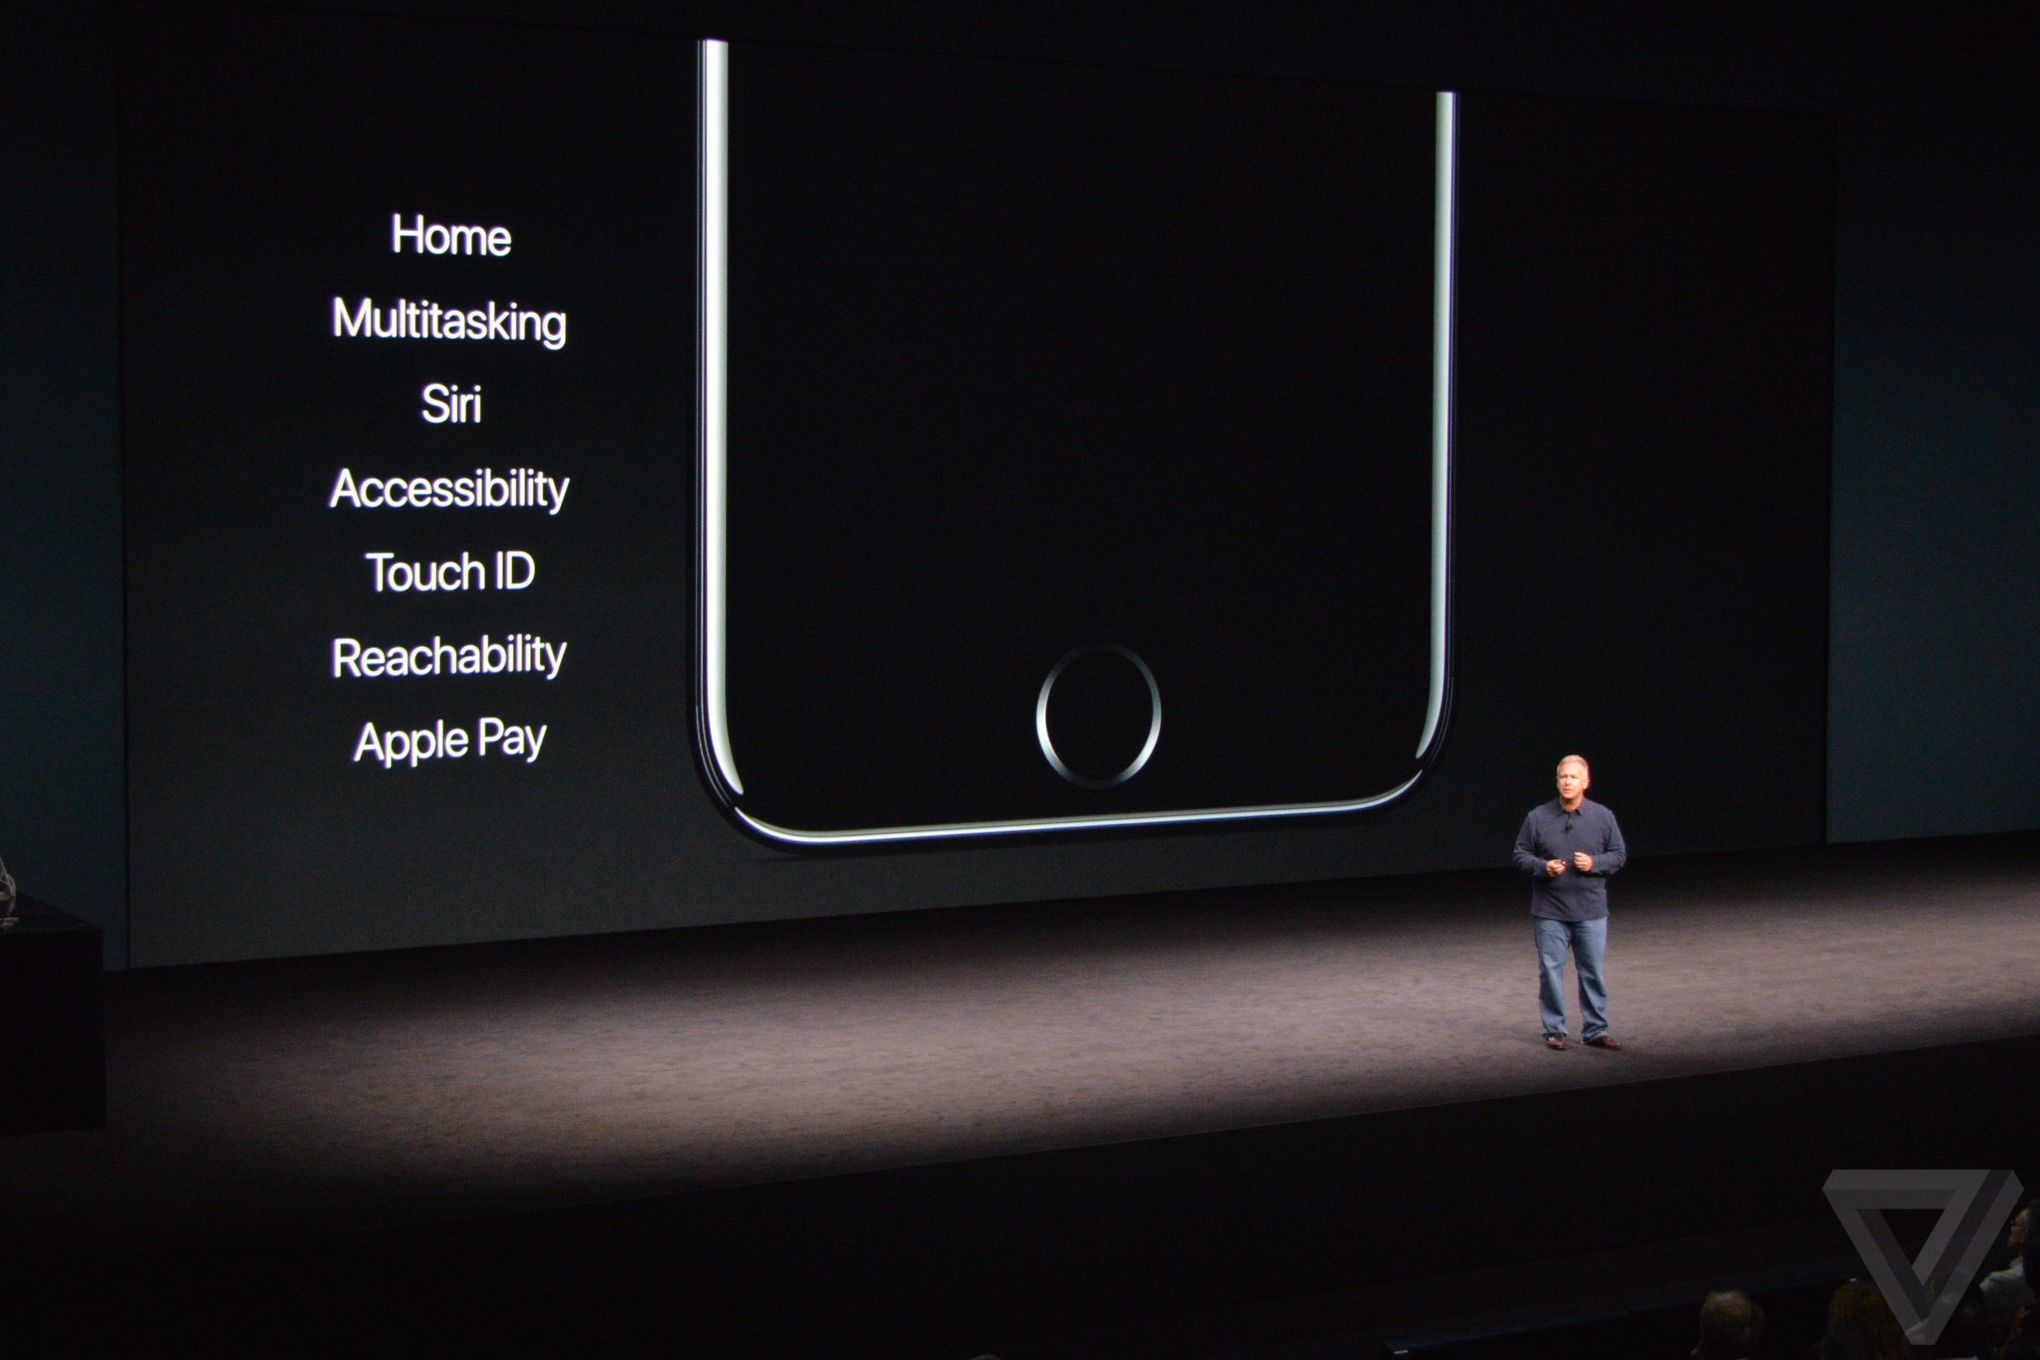 apple-iphone-watch-20160907-4748